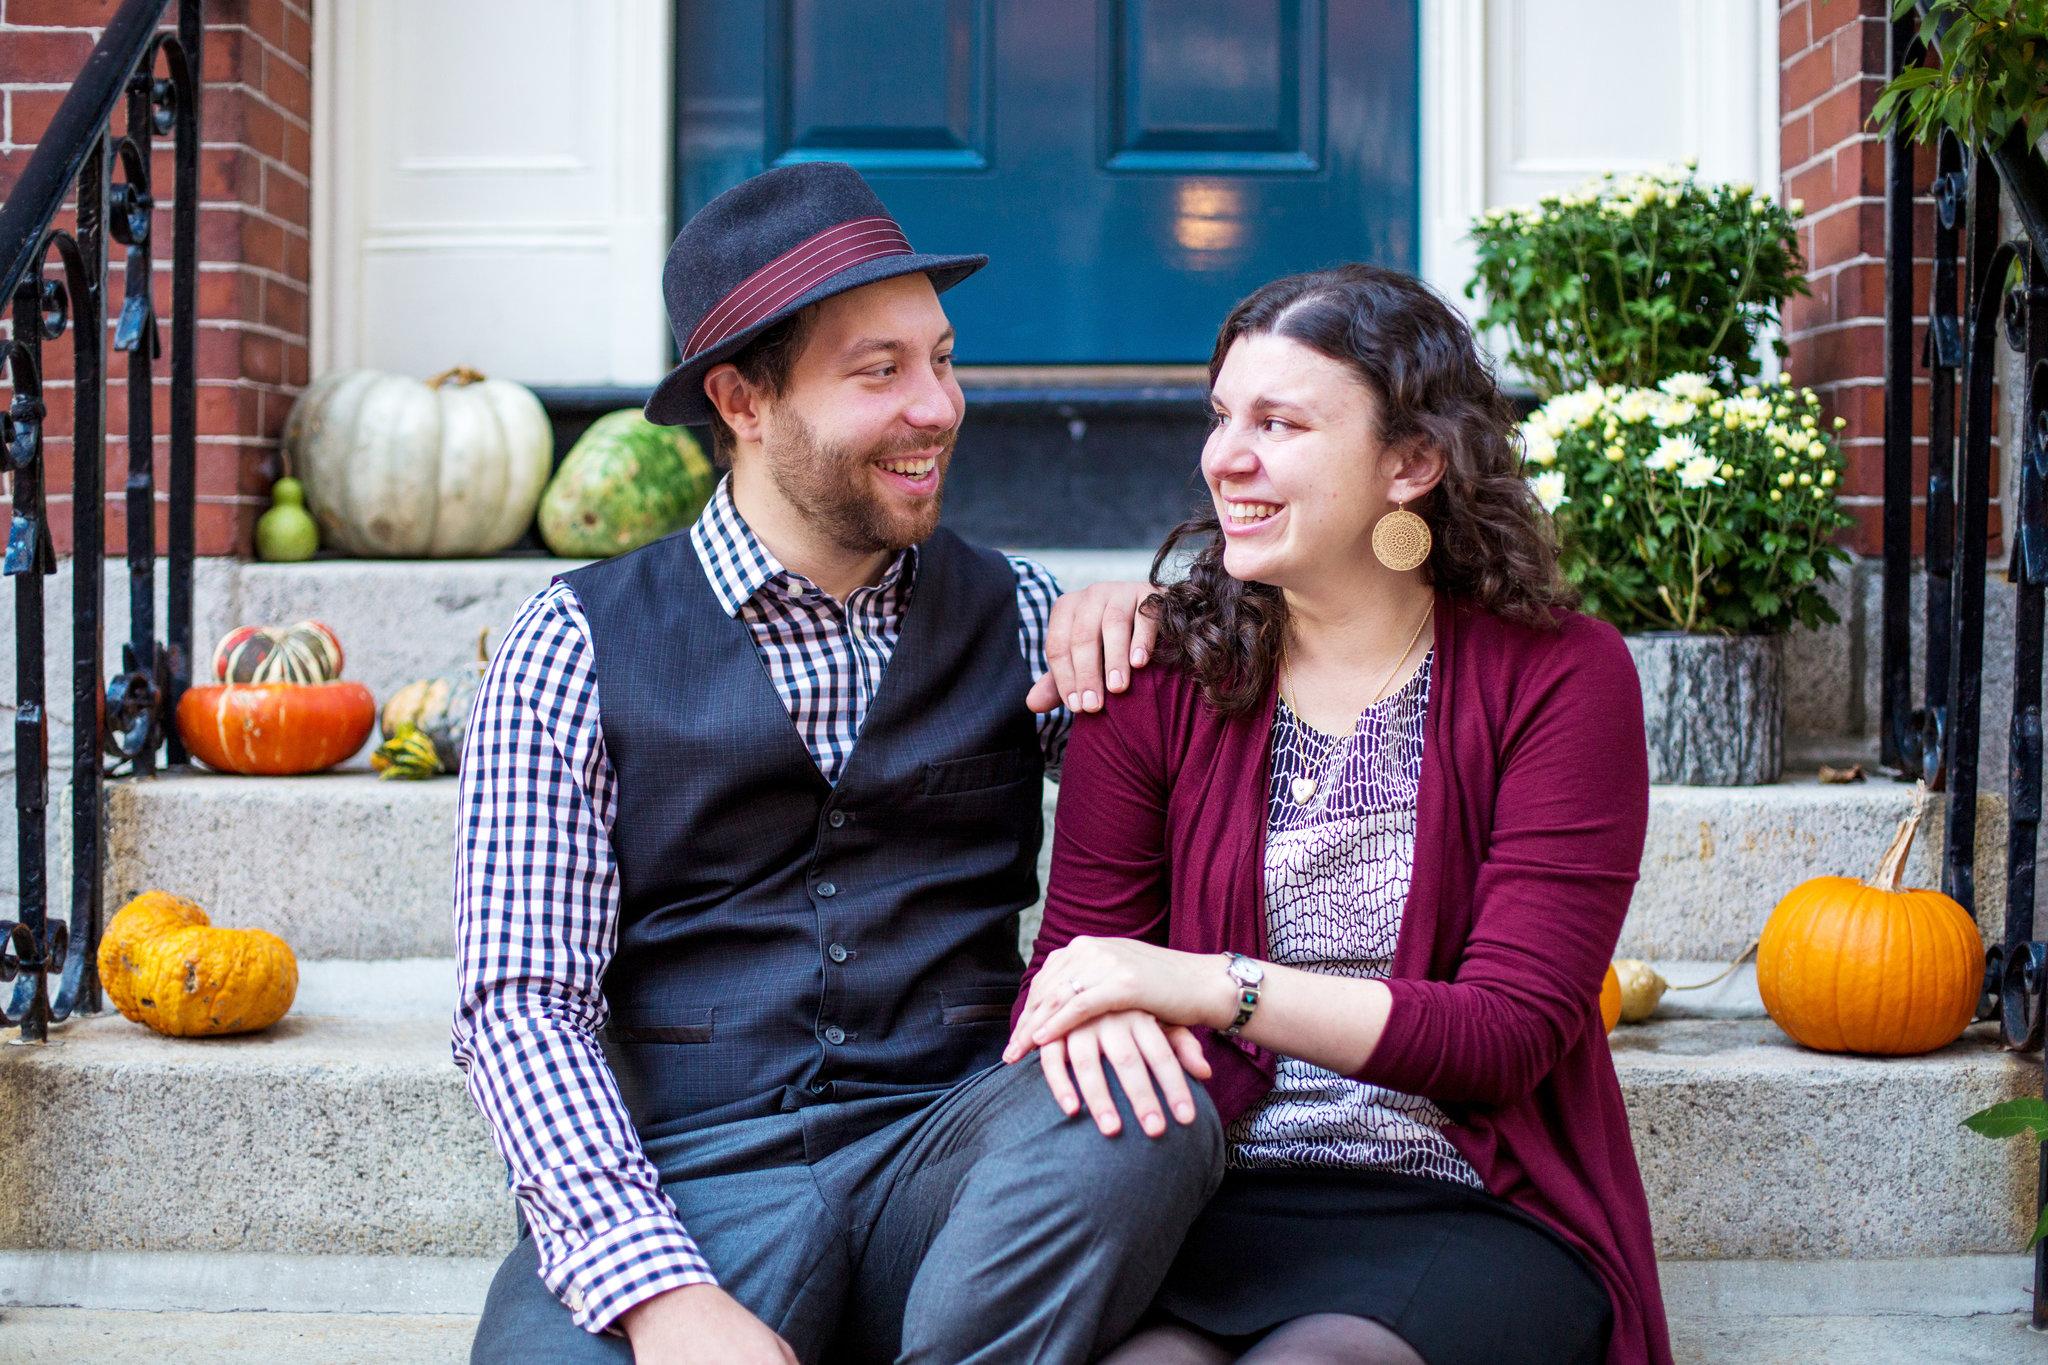 Leah Rosenberg and Getzel Davis